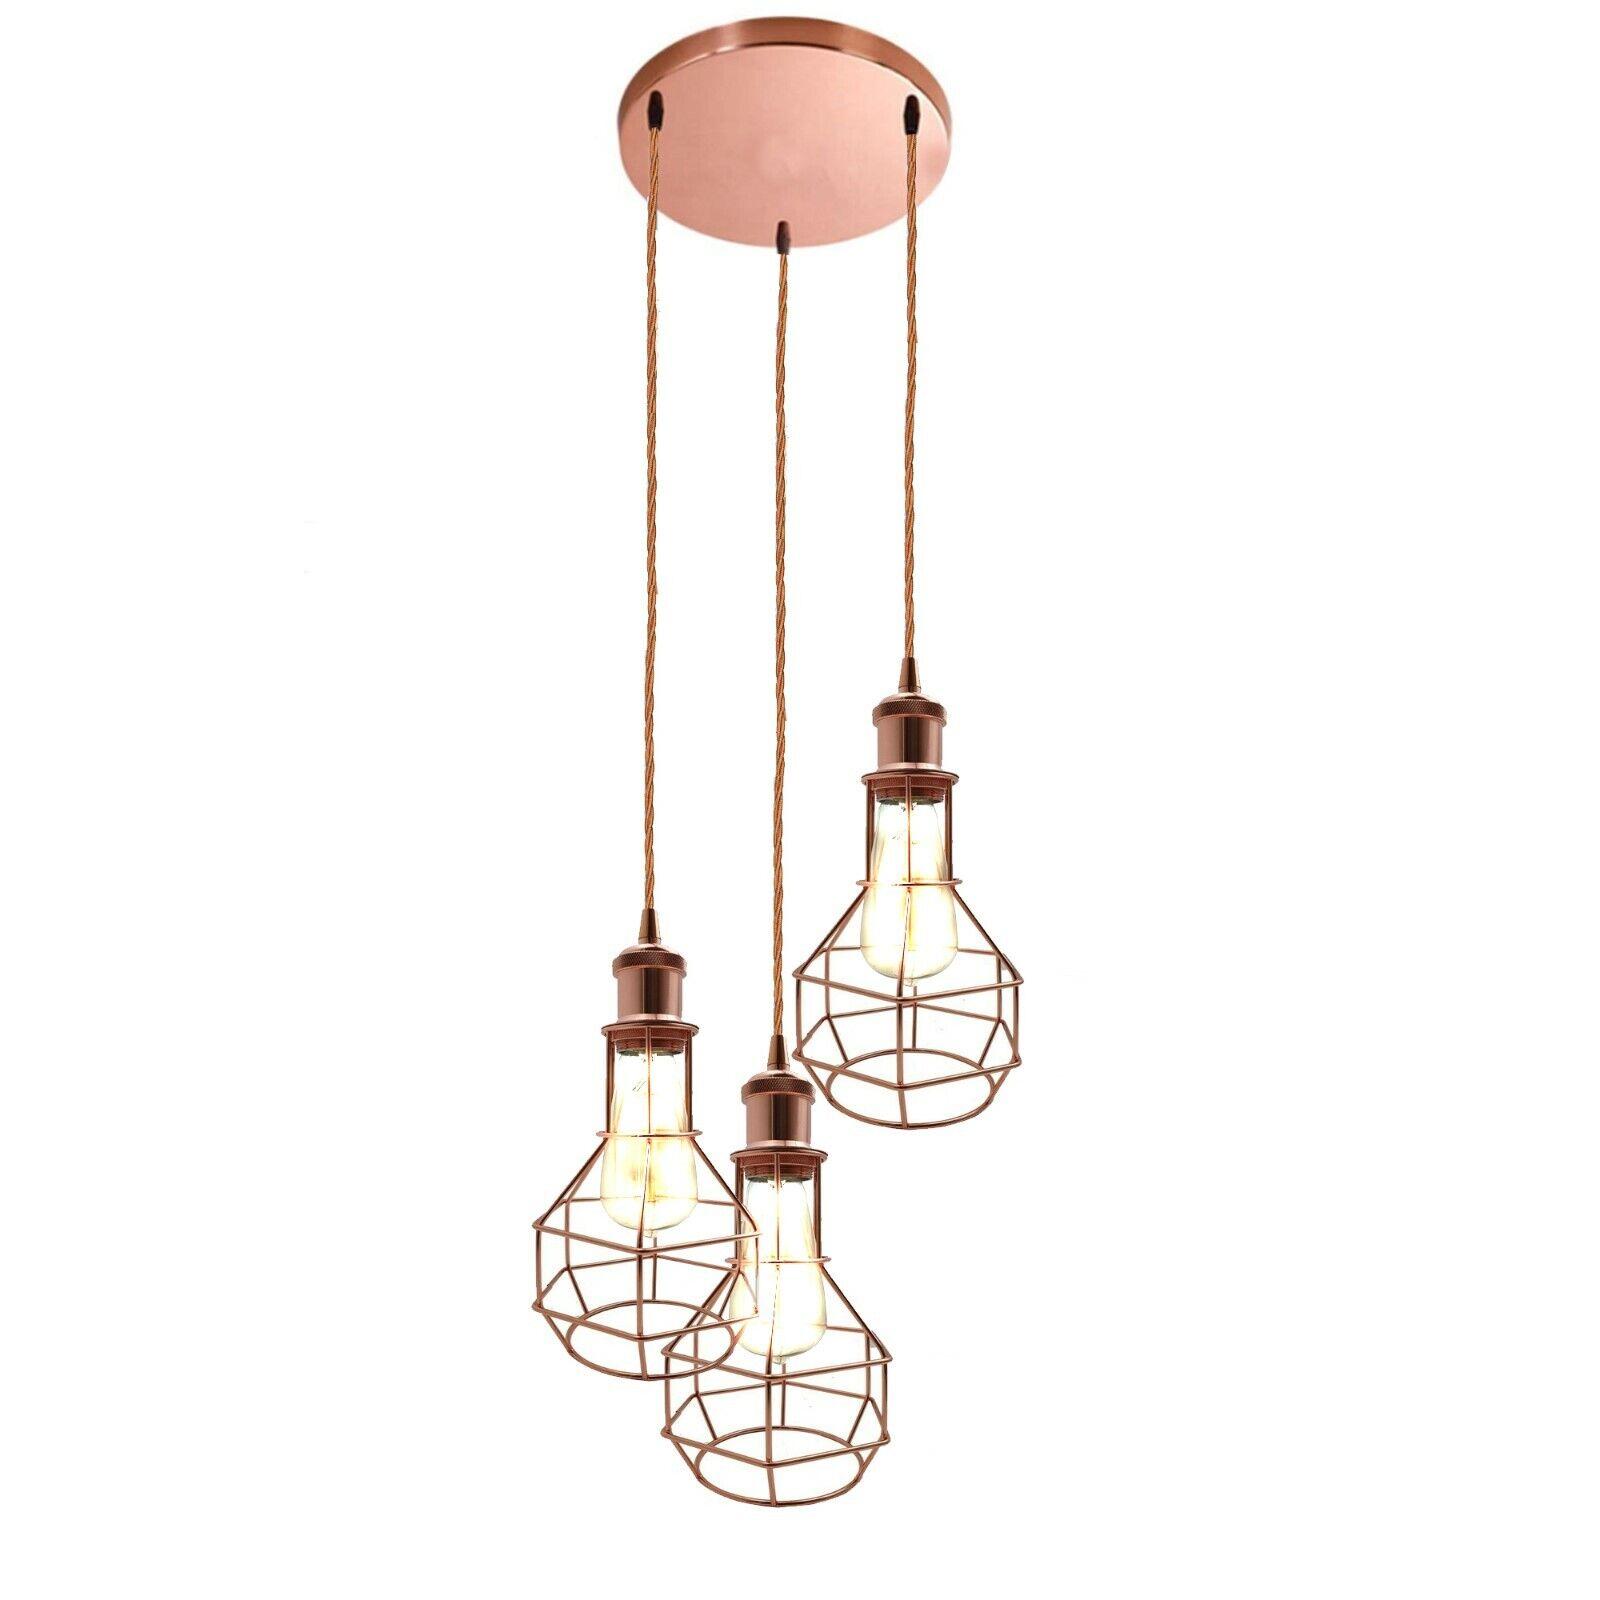 Modern Decke Anhänger Gruppe Beleuchtungskörper Vogelkäfig Stil 3 Kopf Lichter